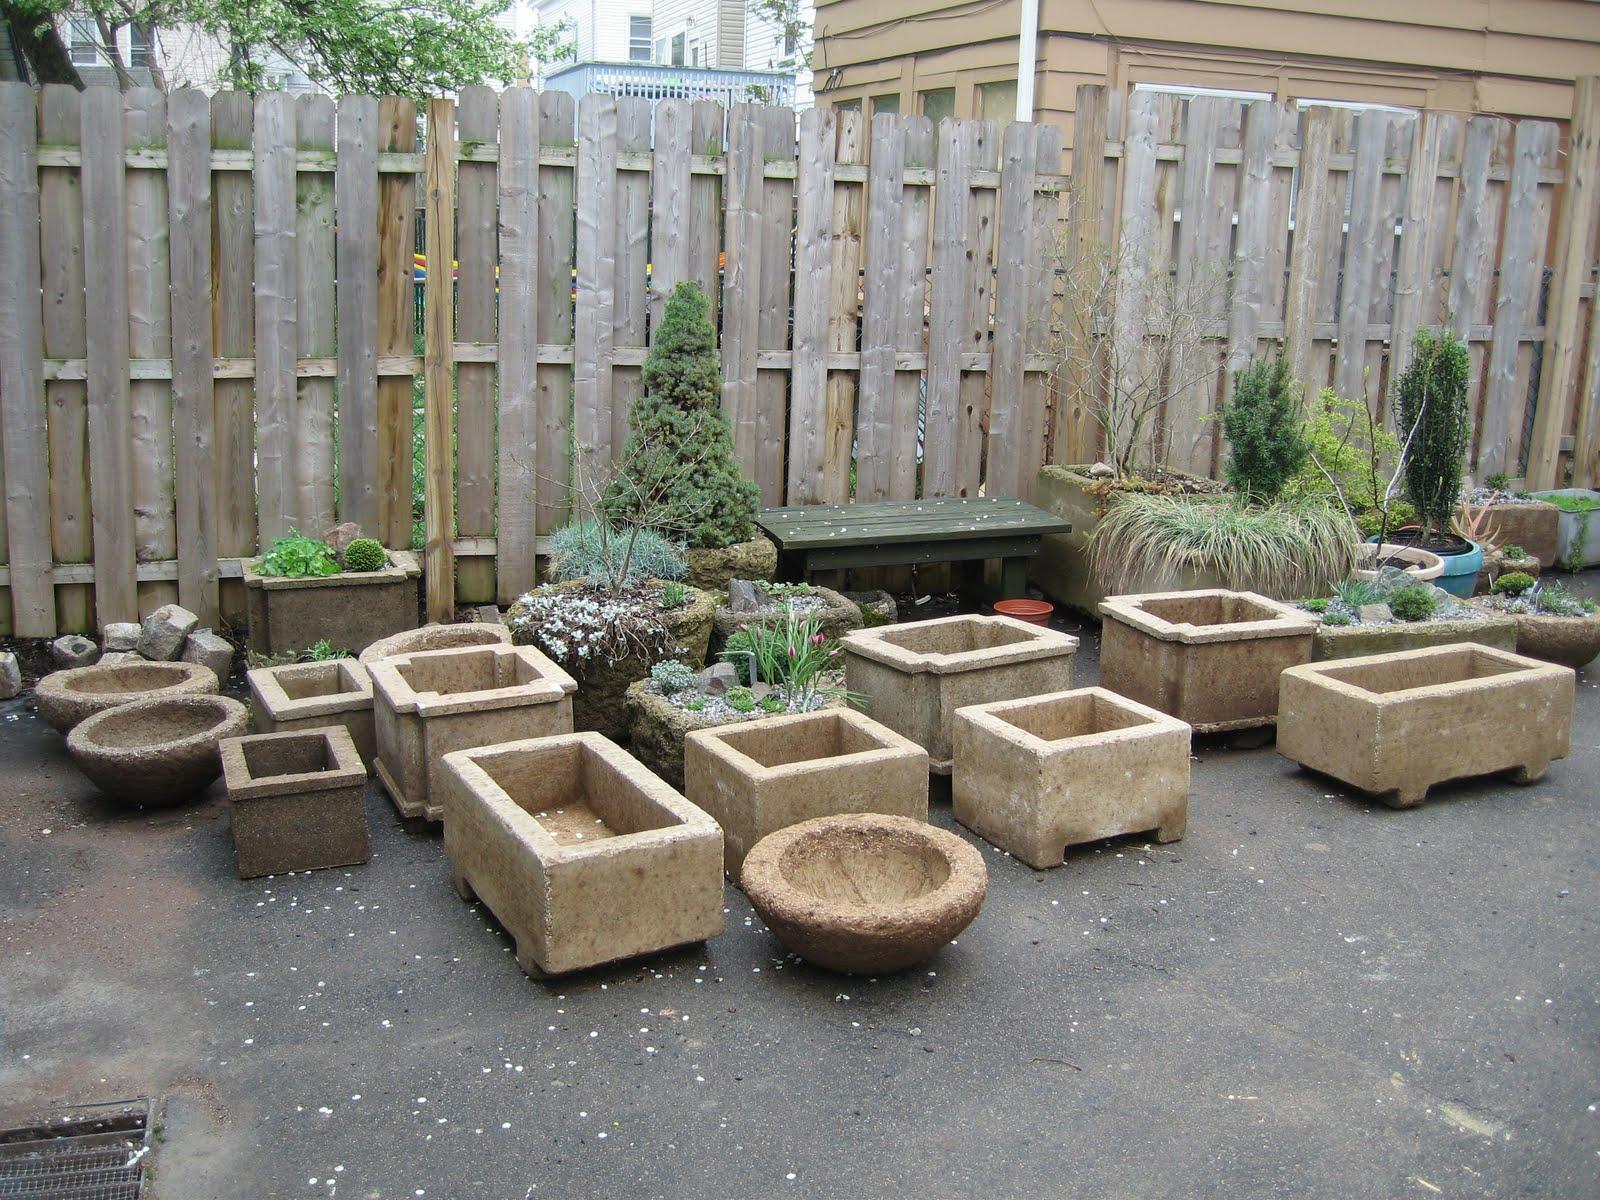 barrow works hypertufa planters for sale